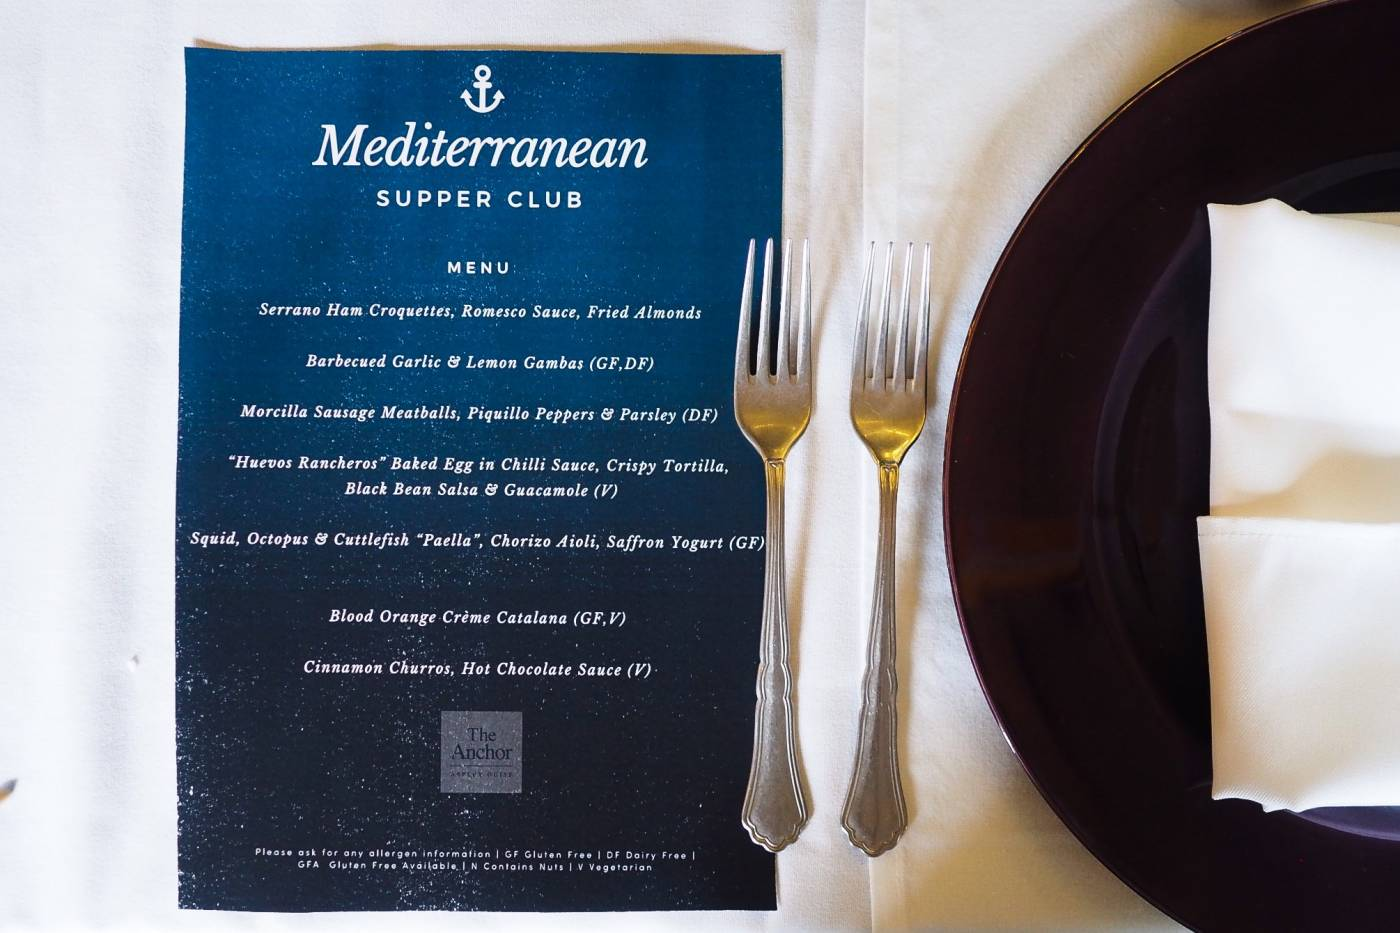 The_Anchor_Aspley_Guise_Mediterranean_Supper_Club(3)